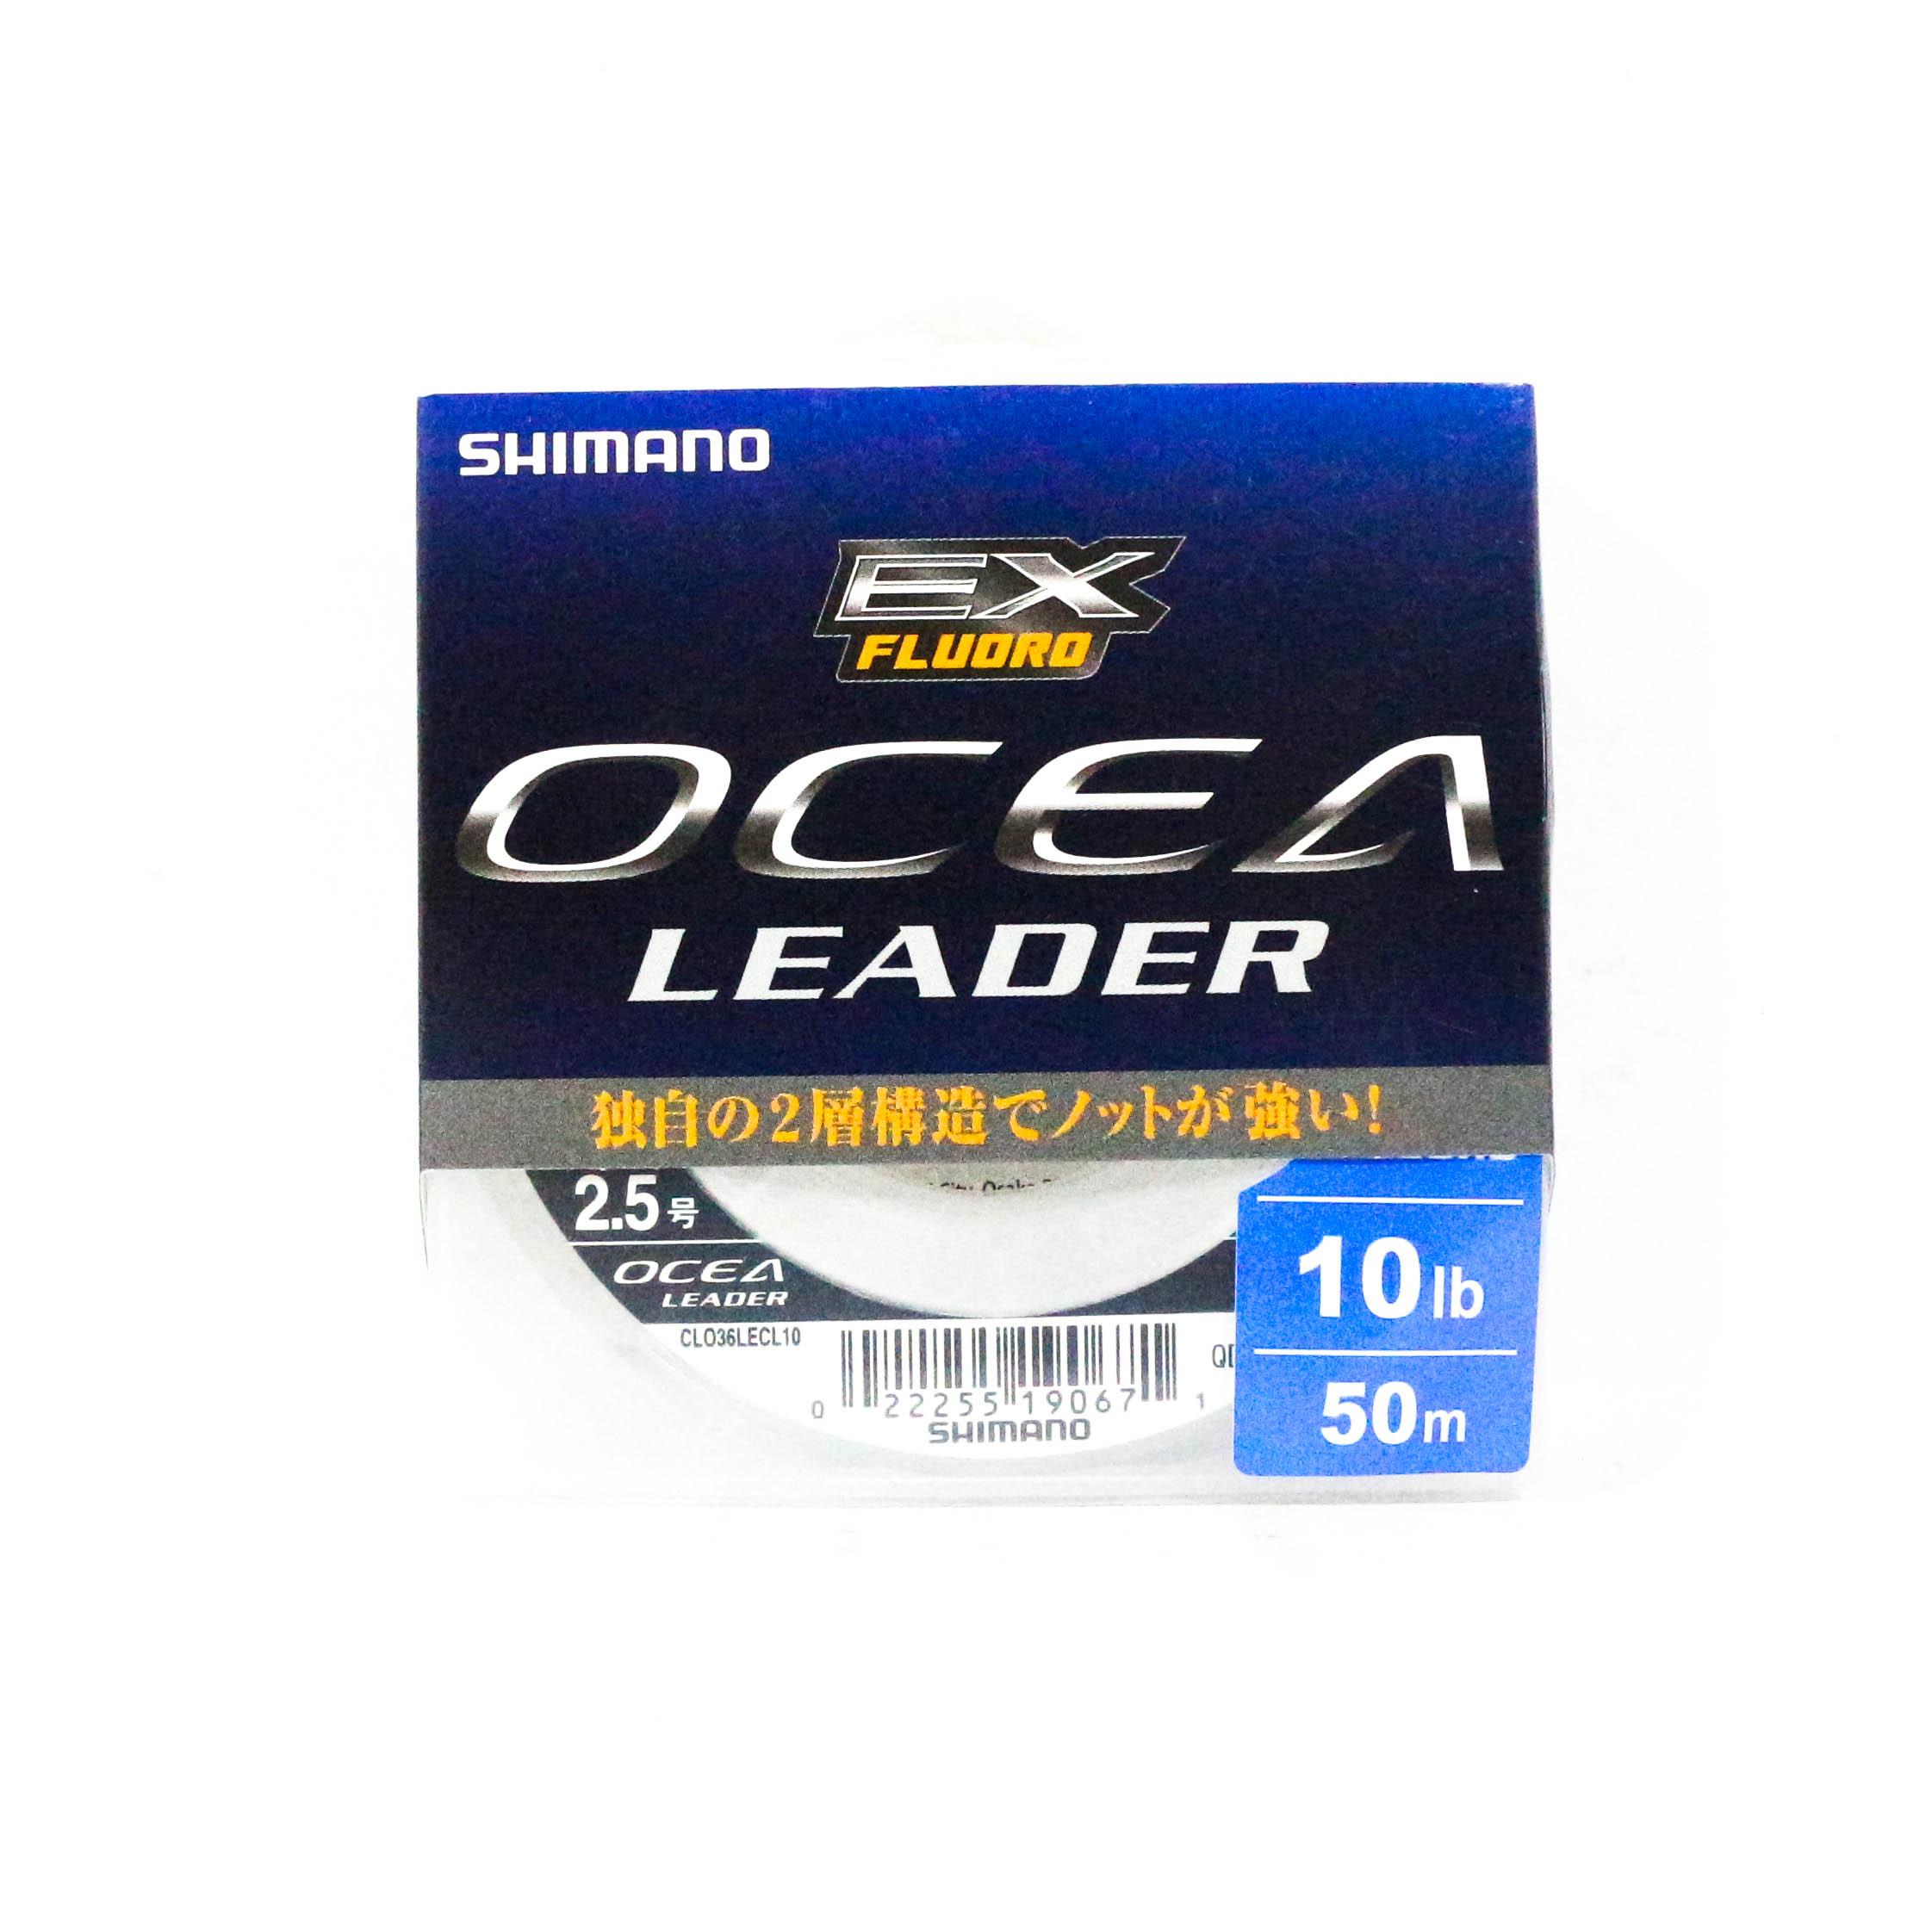 Shimano CL-036L Ocea EX Fluorocarbon Leader Line 50m 10lb (0671)